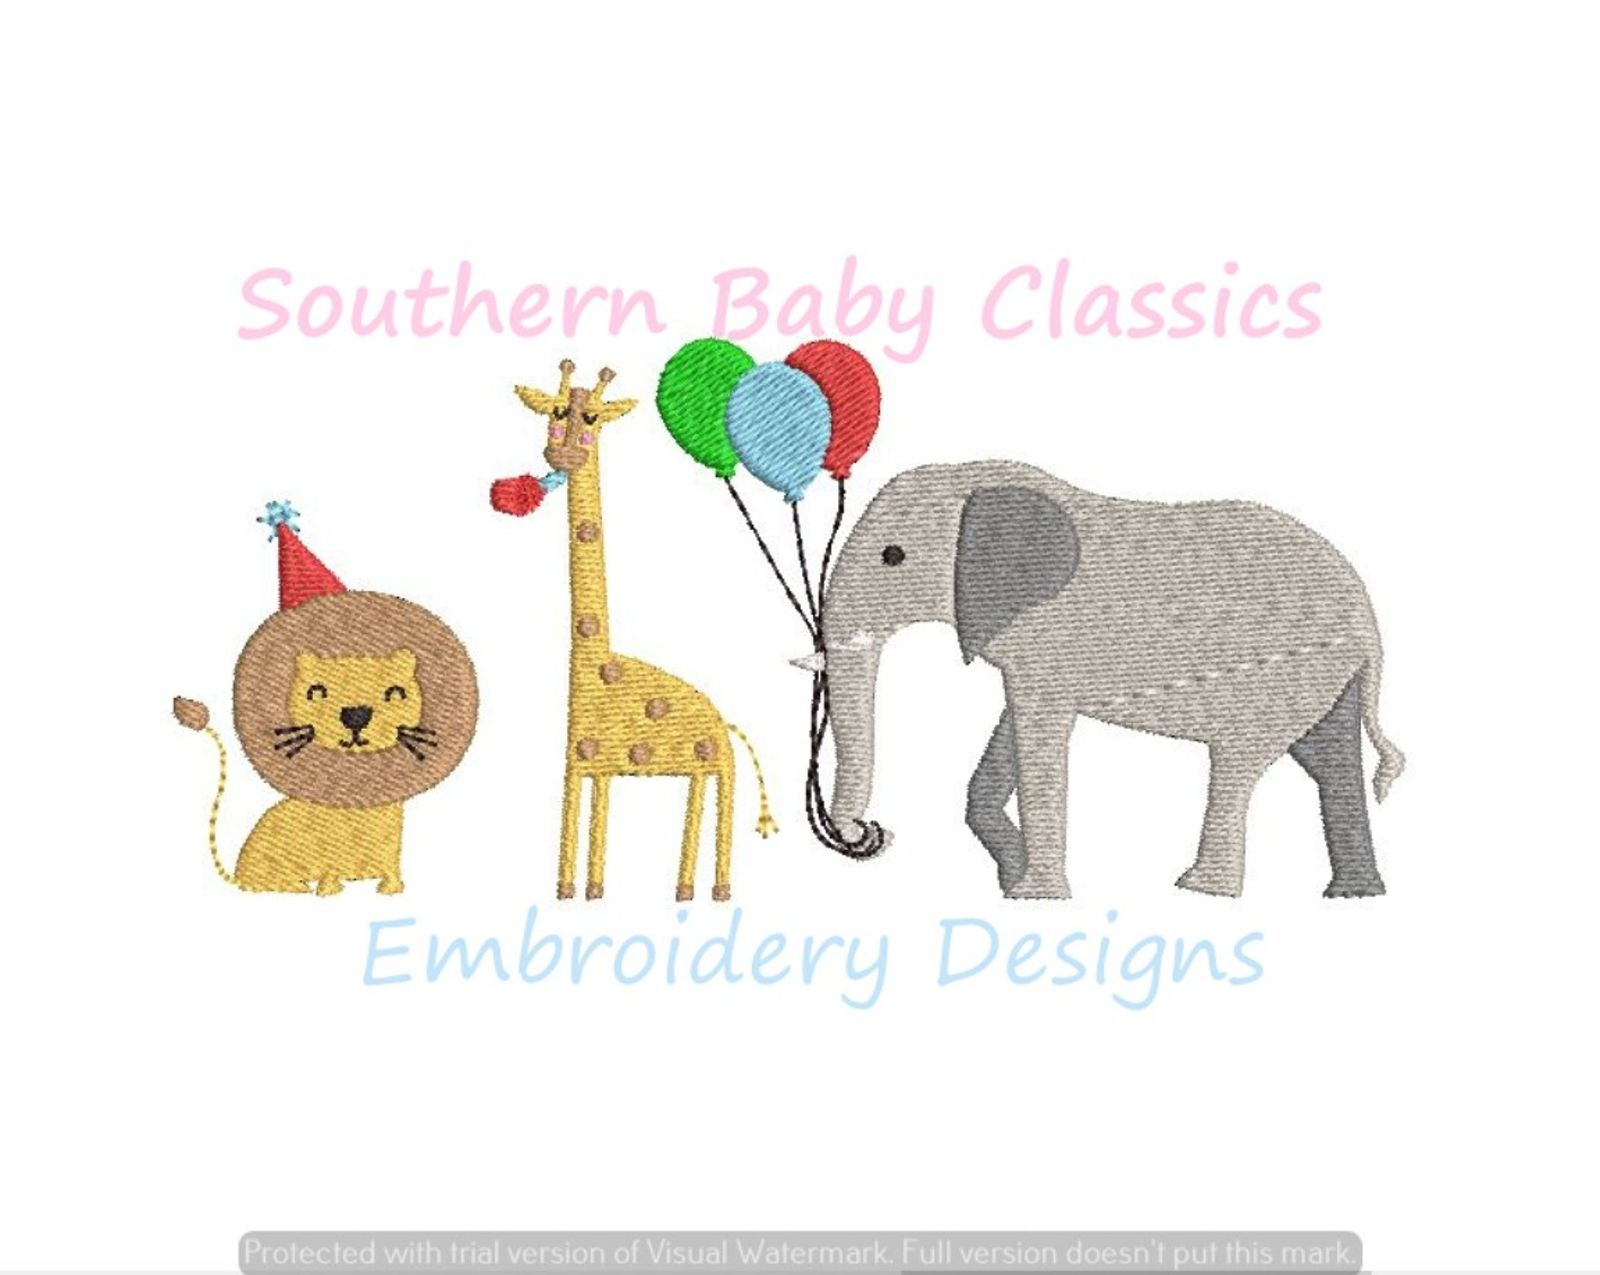 Zoo Safari Birthday Party Animals Birthday Machine Embroidery Design Lion Giraffe Elephant Jungle Machine Embroidery Designs Embroidery Designs Machine Embroidery